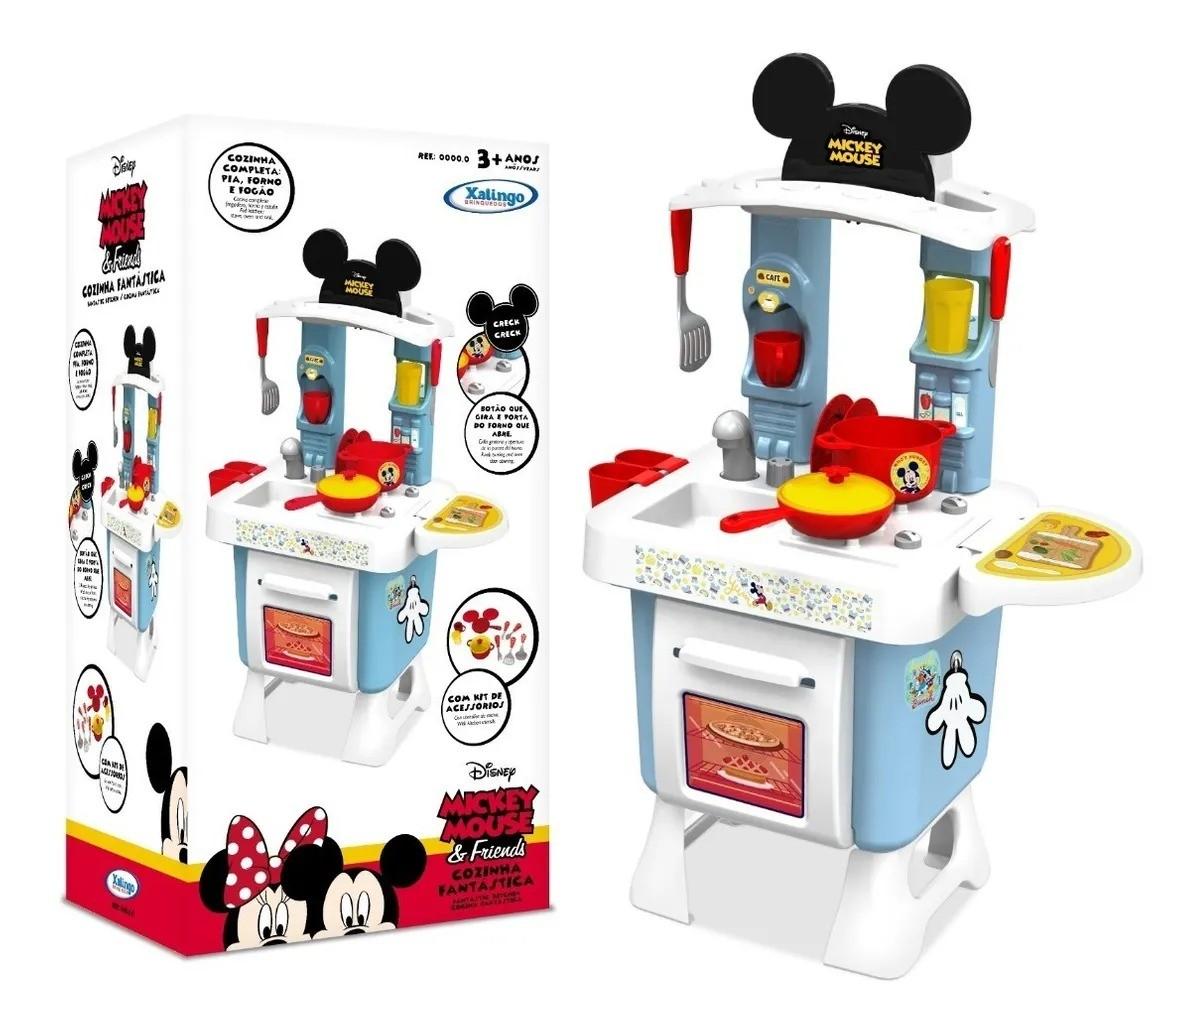 Cozinha Infantil Fantástica Mickey Mouse & Friends Completa Xalingo